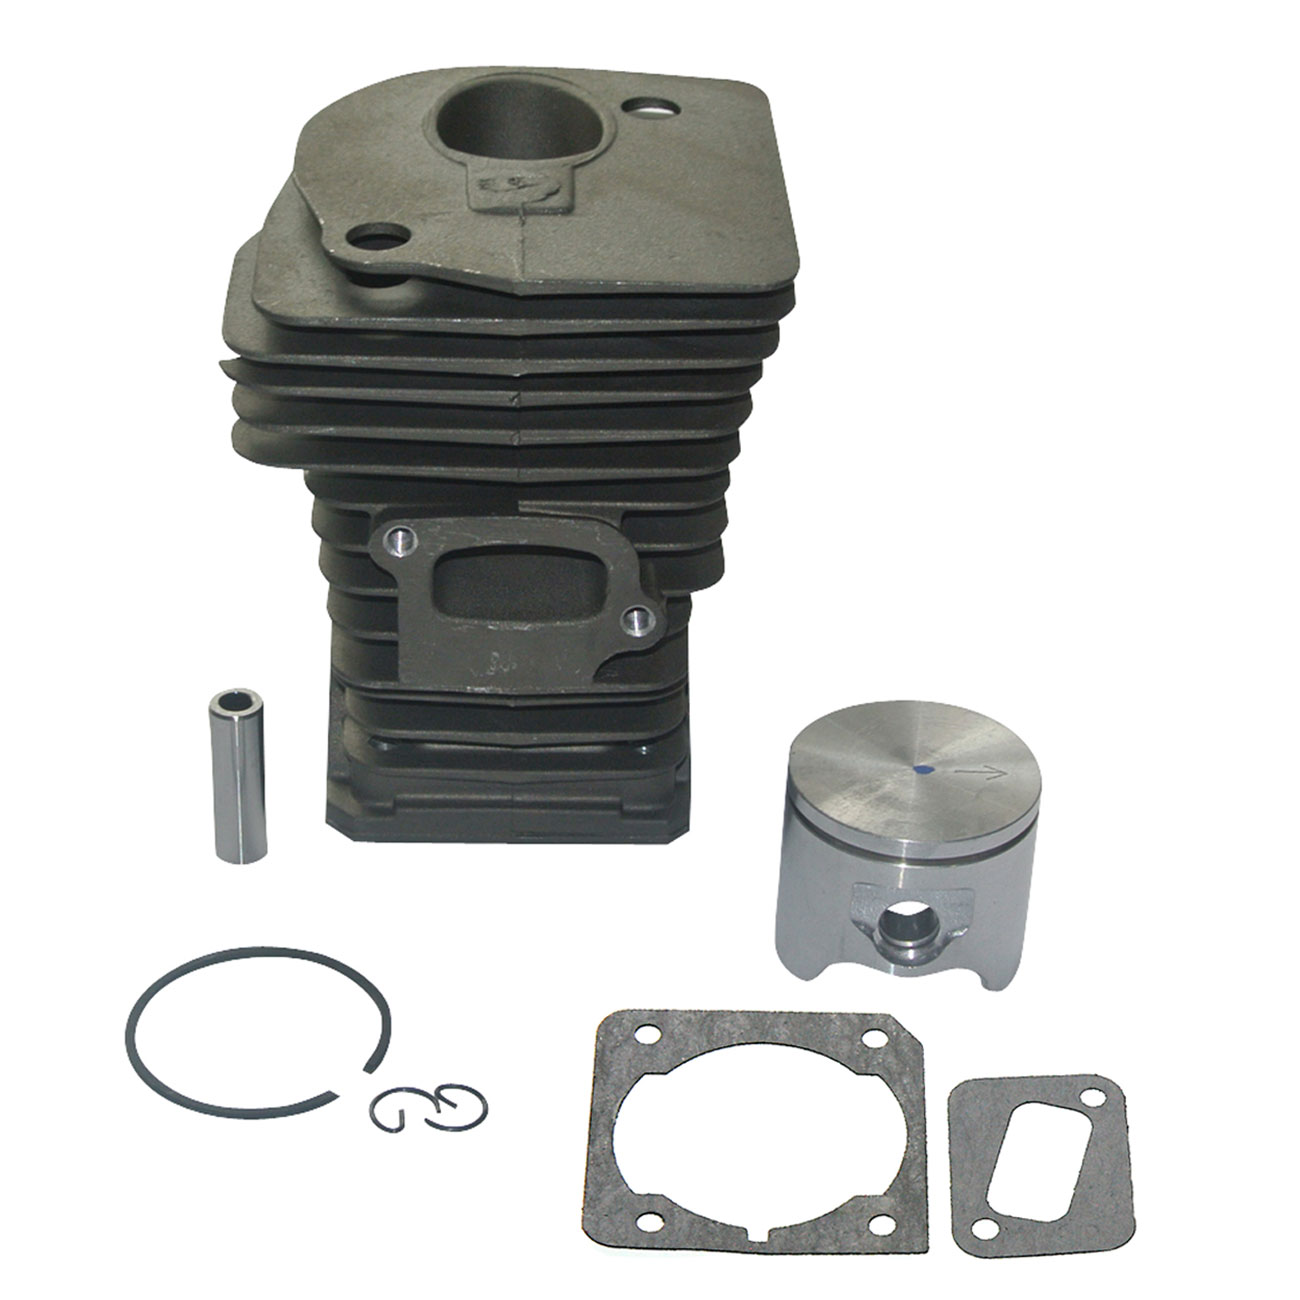 Cylinder Engine Kit Fit HUSQVARNA 340 345 Chainsaw 42mm